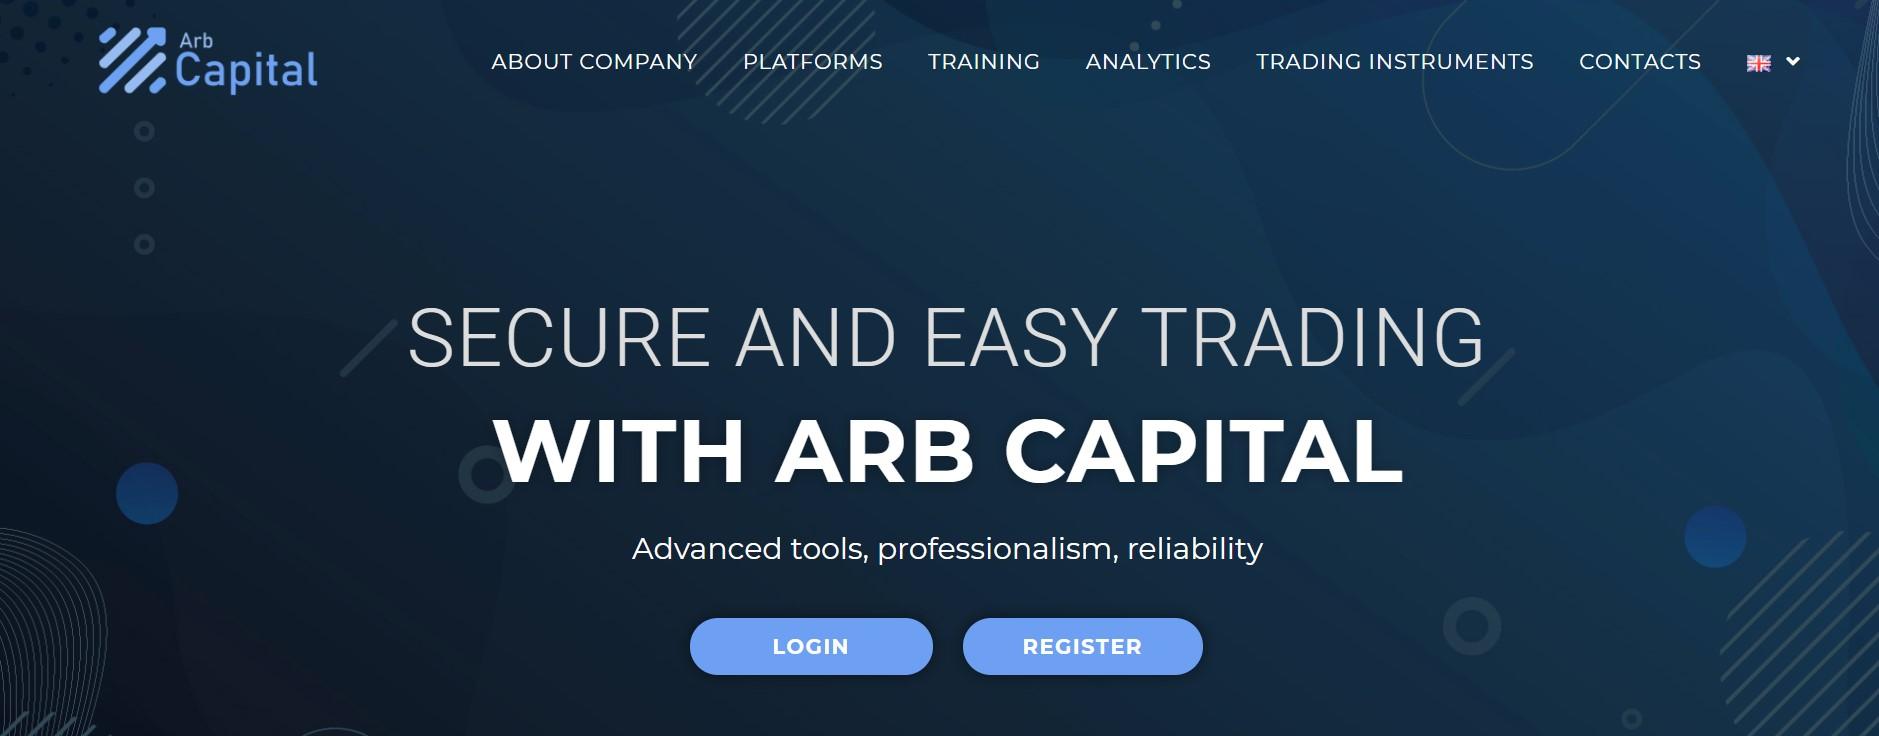 Arb Capital website